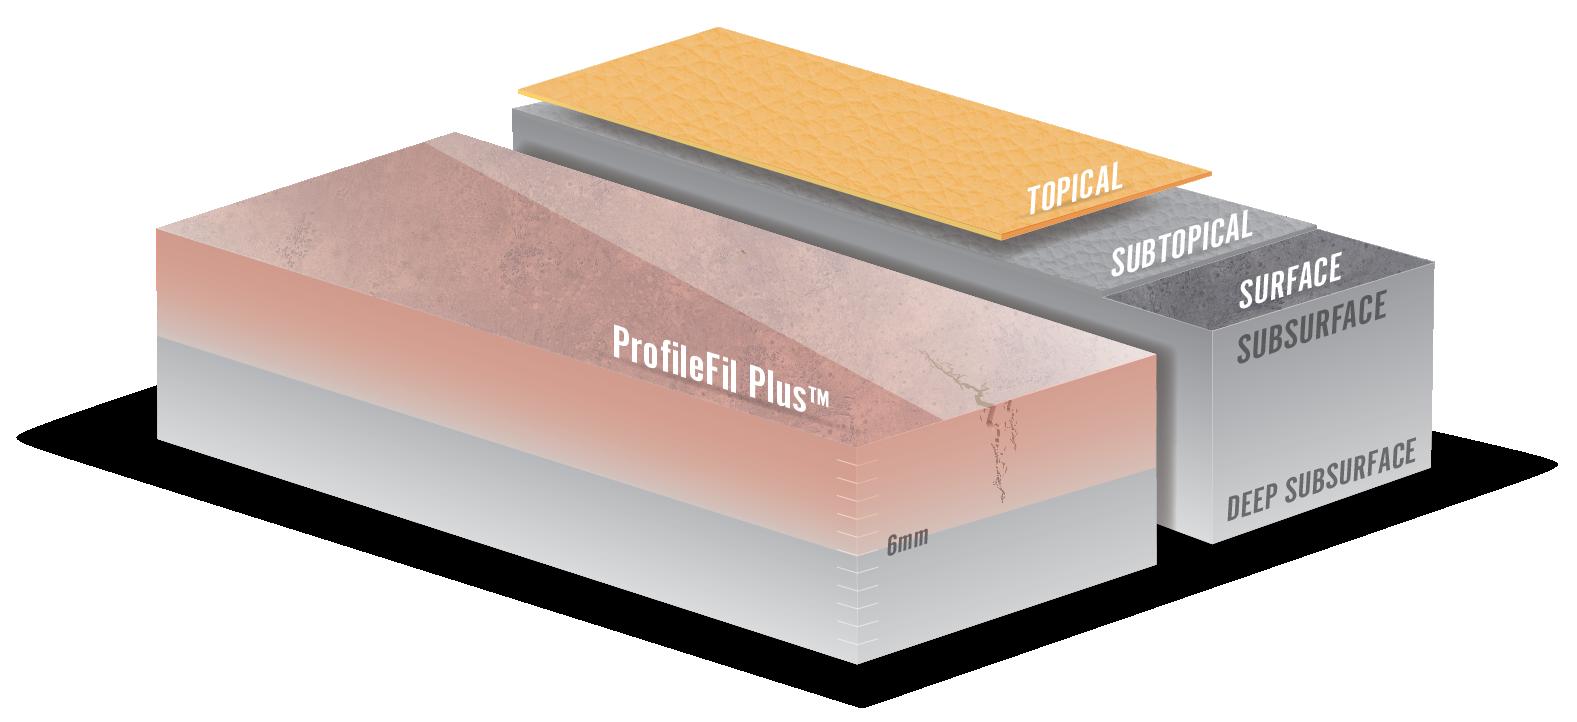 ProfileFil Plus Substrate Index